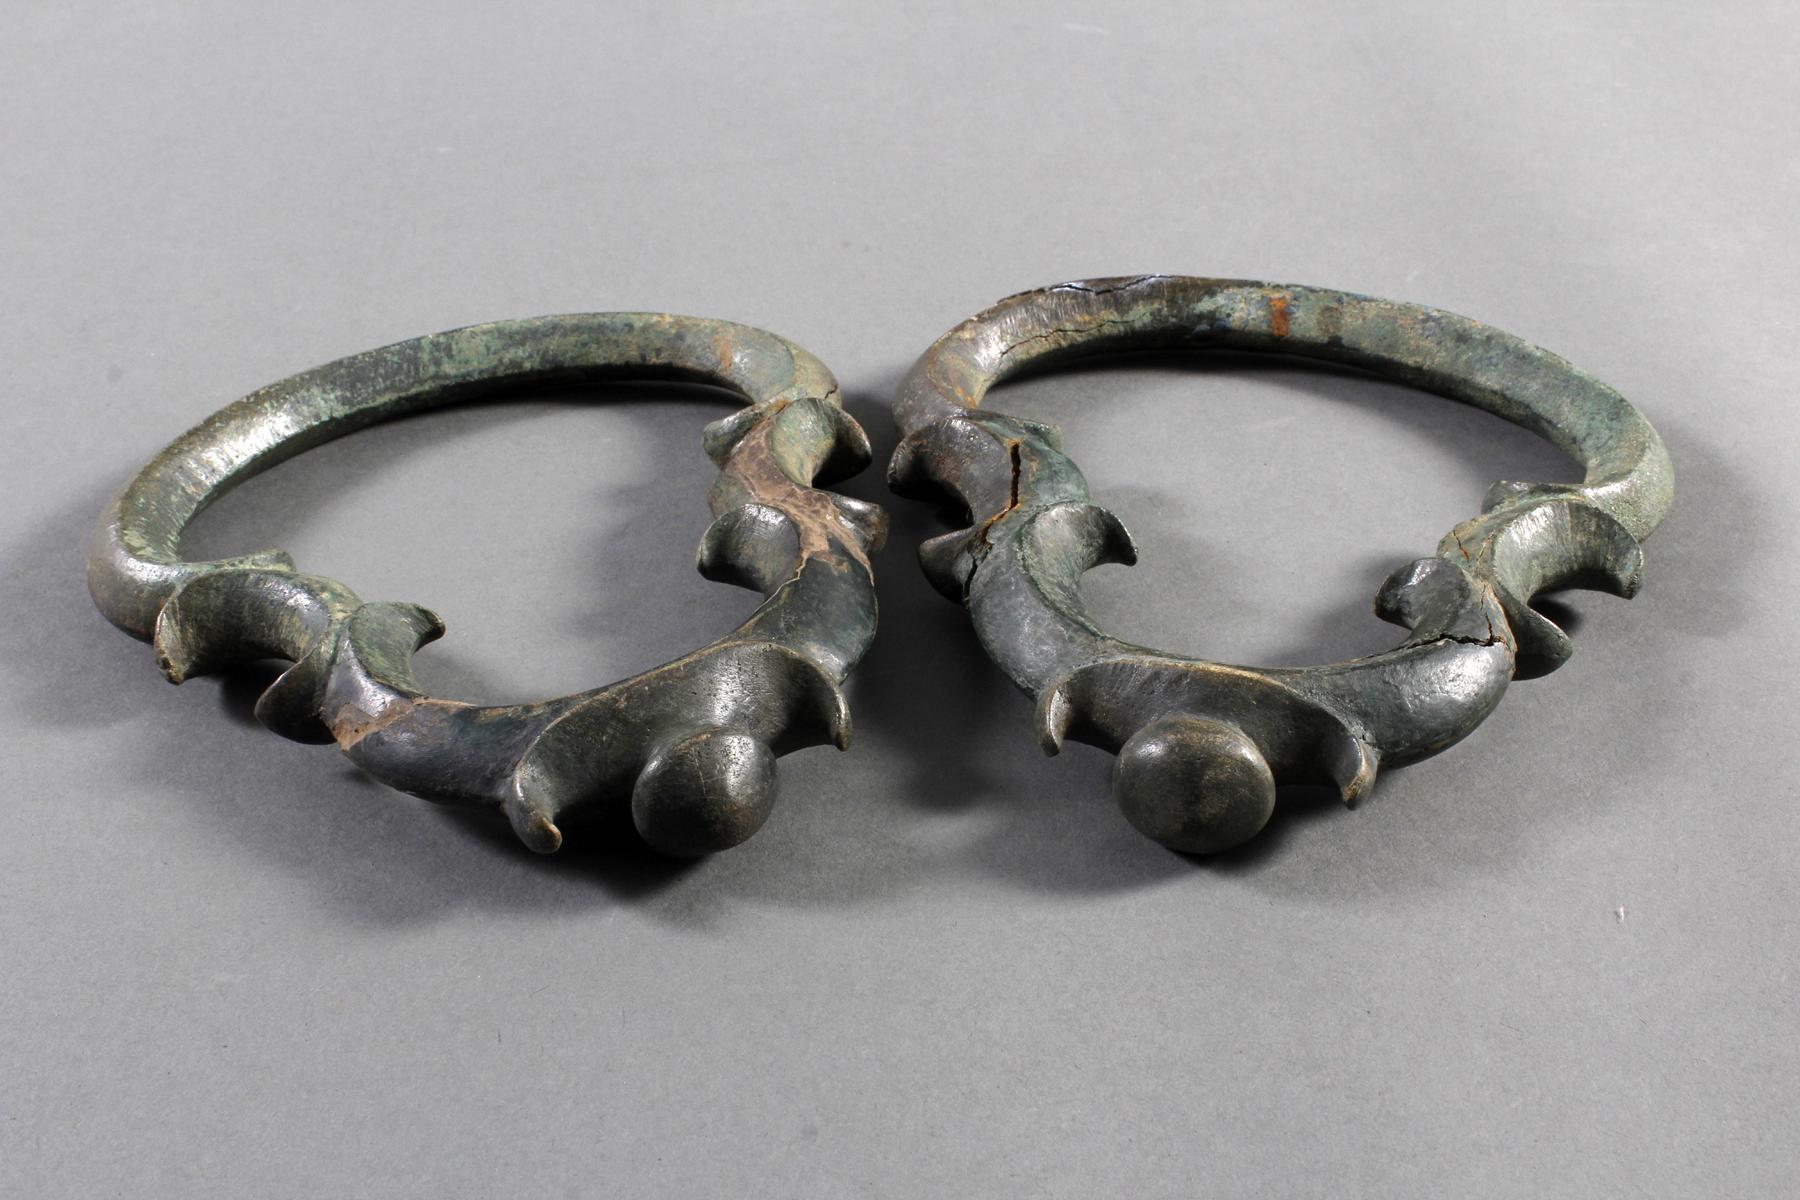 2 Glücksbringersymbole aus Bronze, Angkor 12./13. Jahrhunder-2